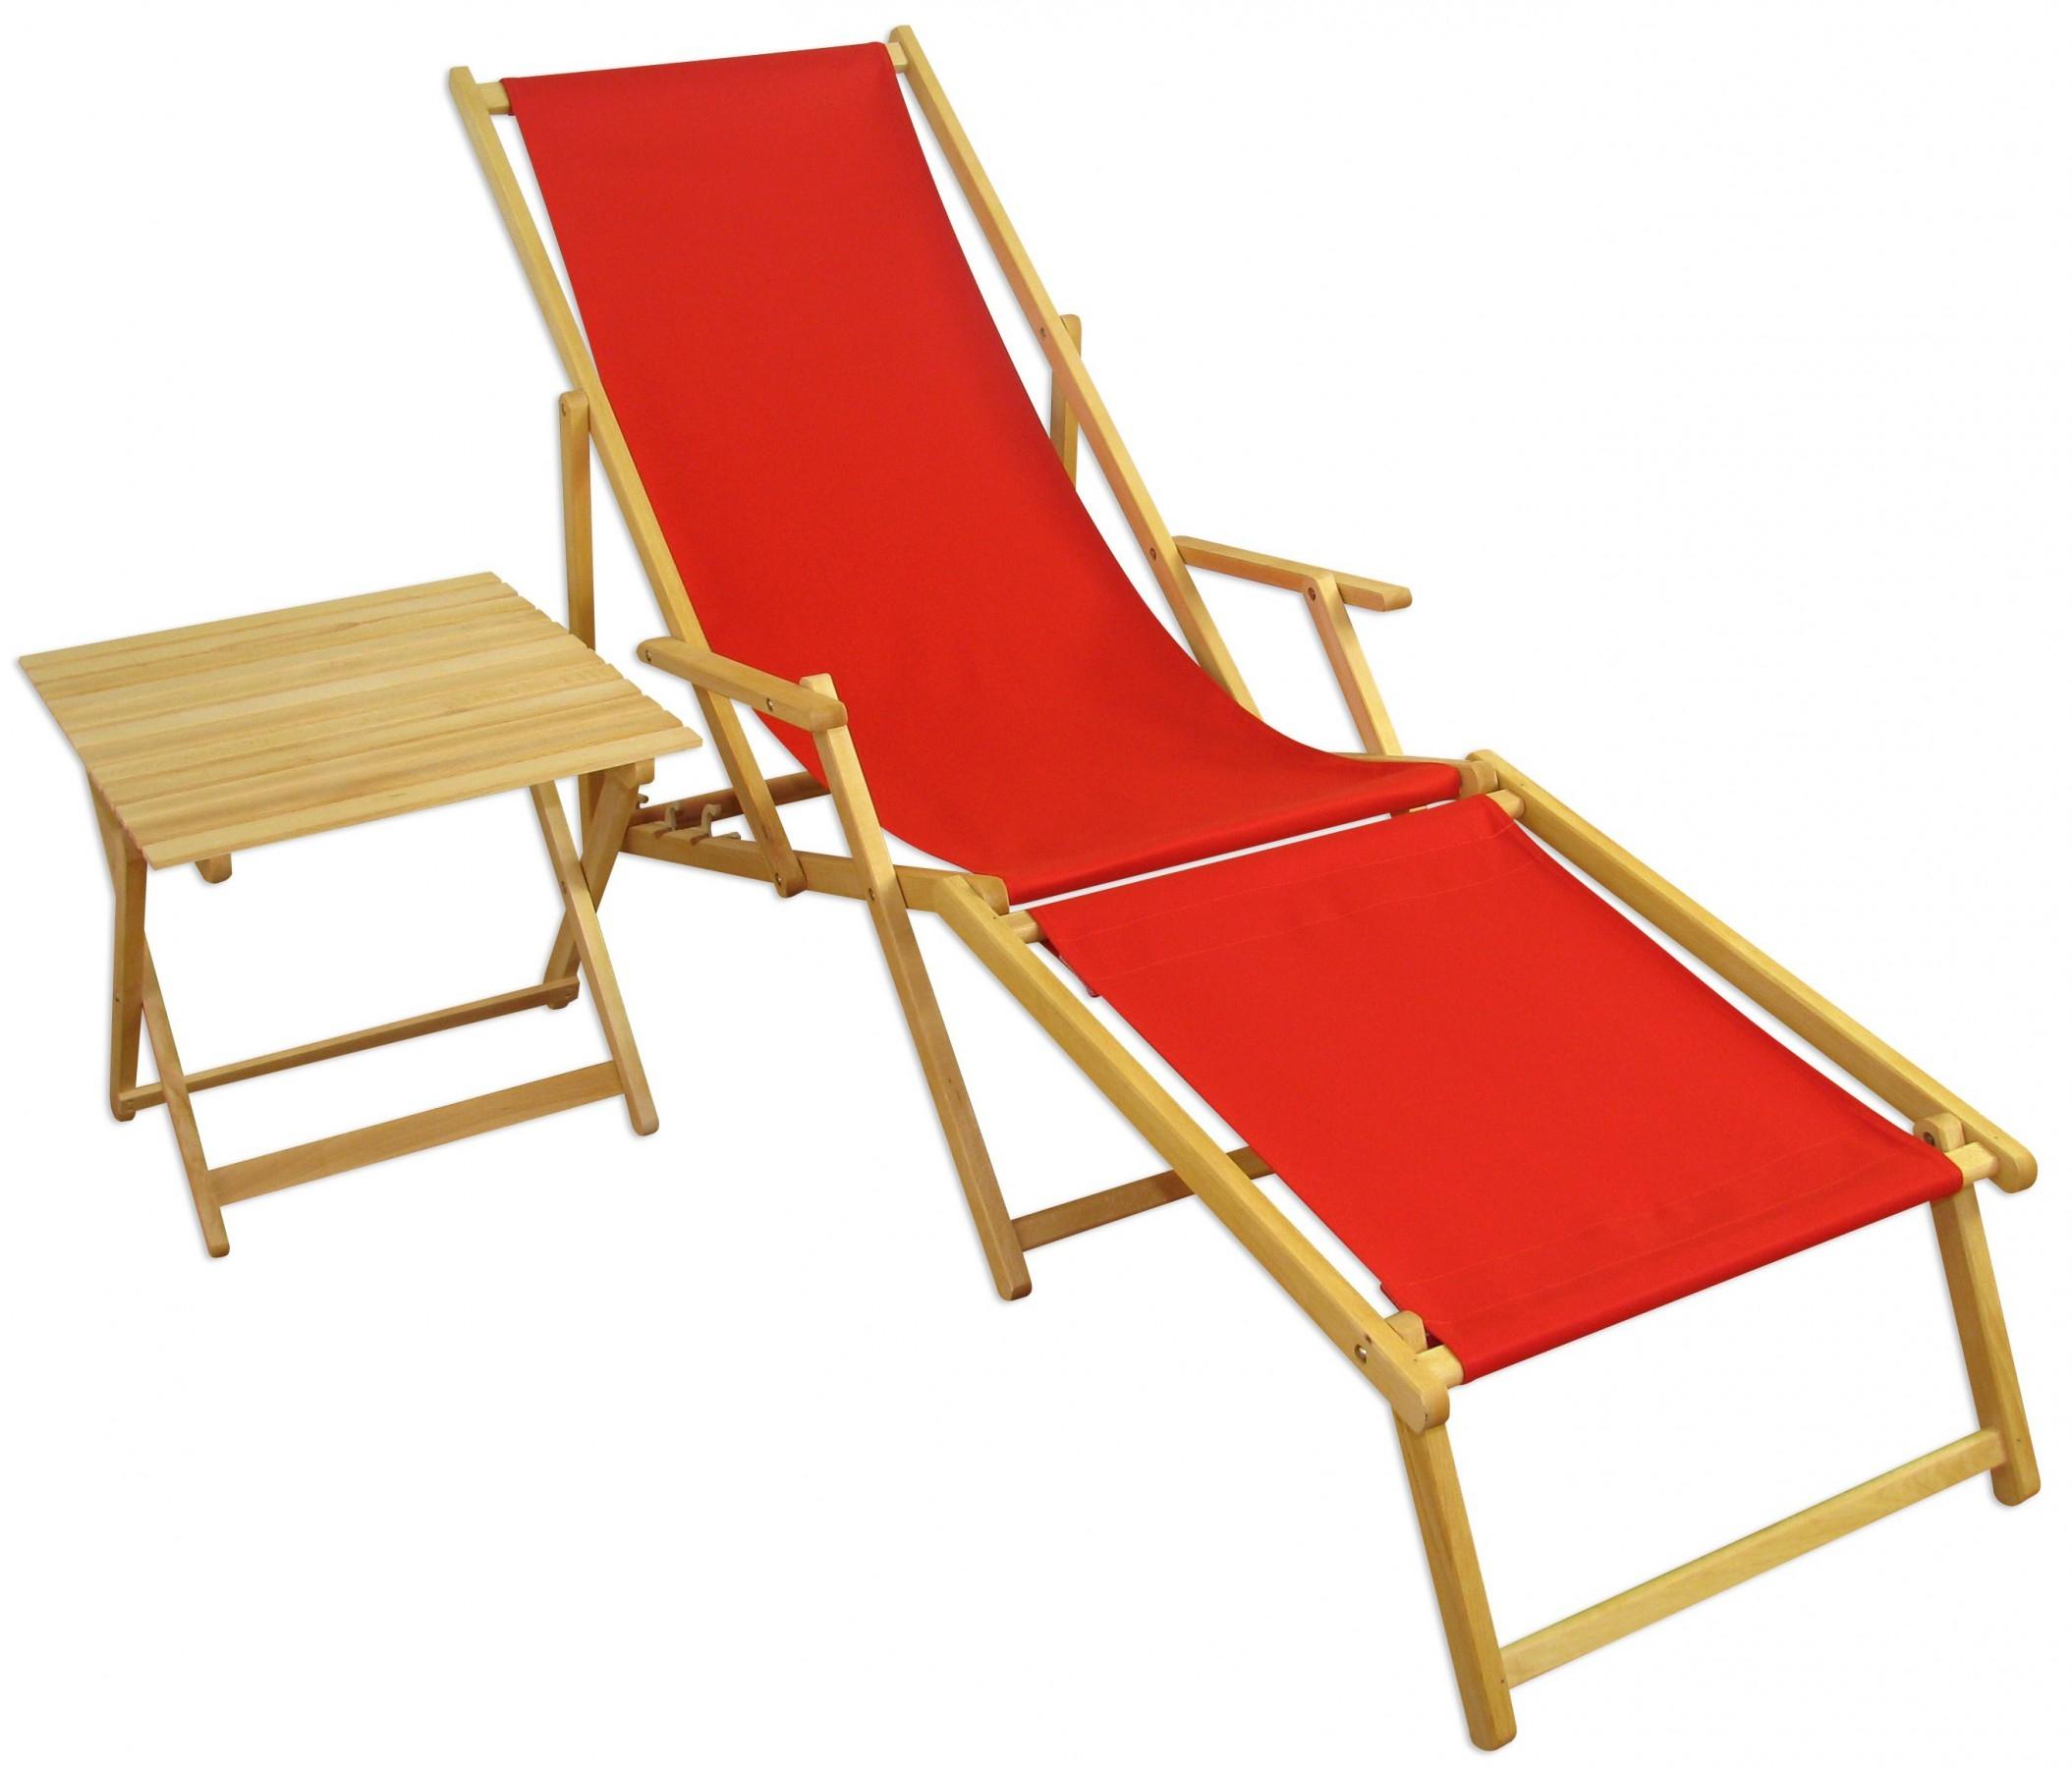 Full Size of Garten Liegestuhl Lidl Holz Klappbar Lafuma Alu Ikea Bauhaus Obi Küche Kosten Miniküche Kaufen Betten 160x200 Sofa Mit Schlaffunktion Bei Modulküche Wohnzimmer Liegestuhl Ikea